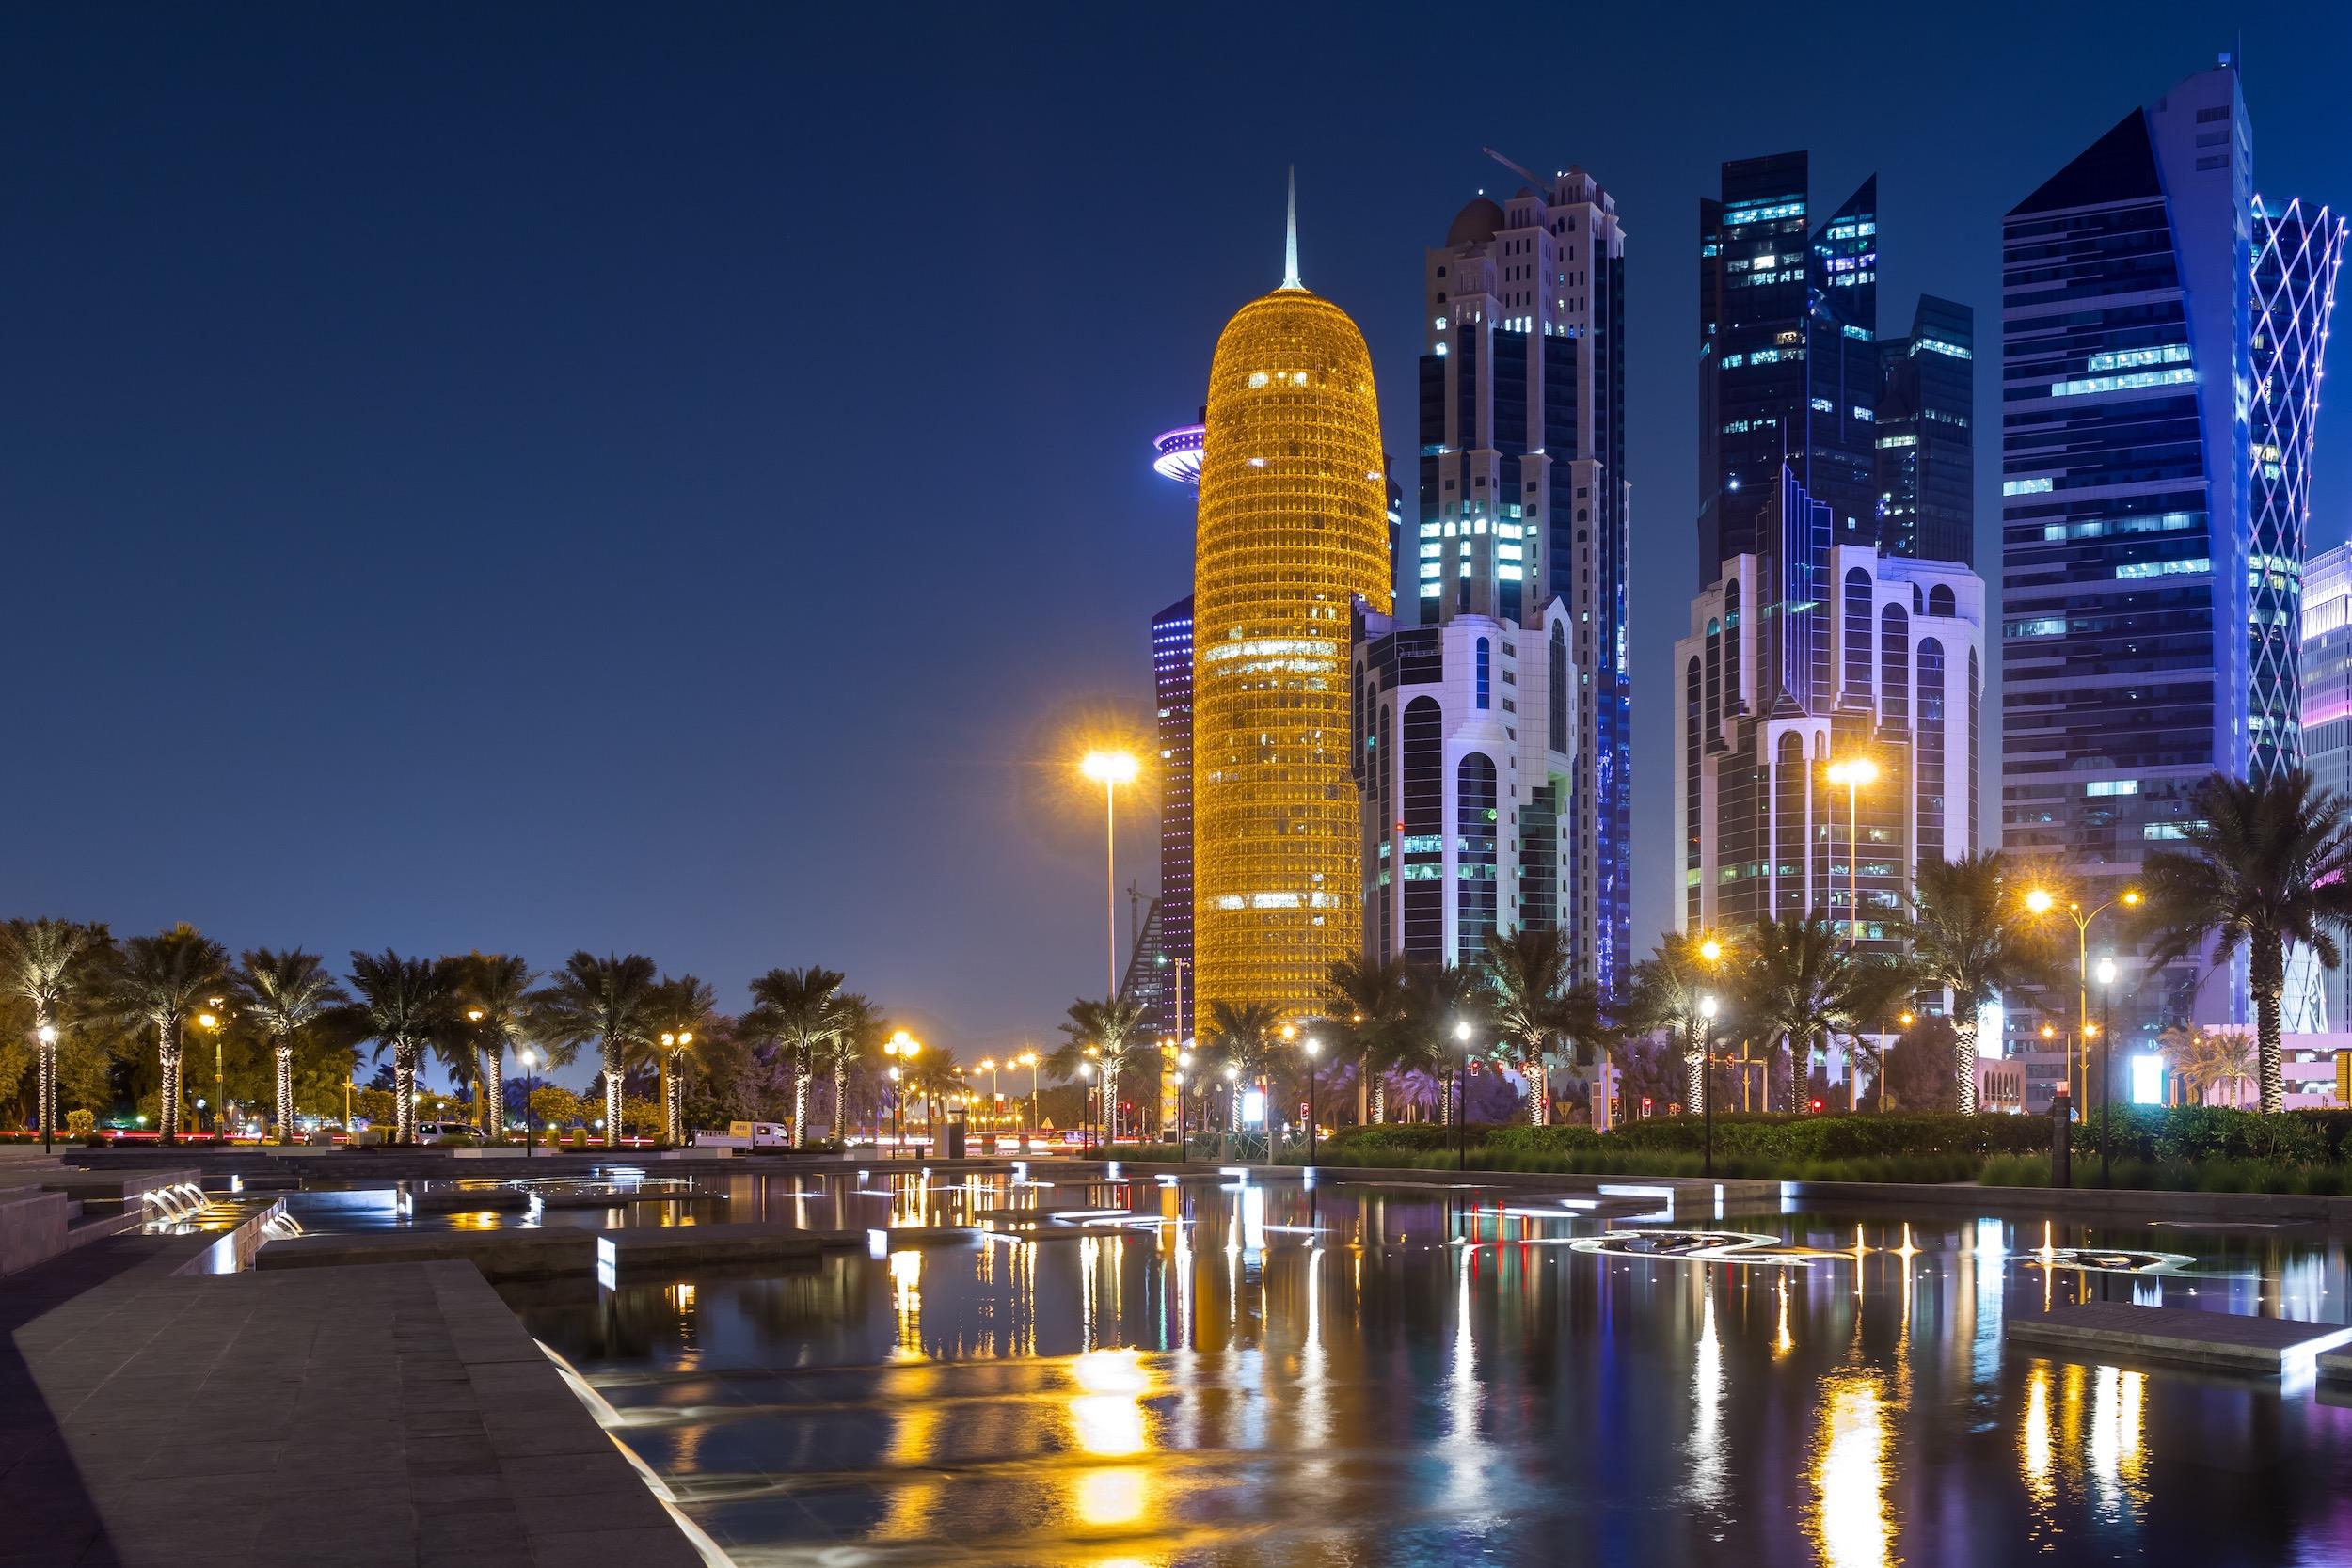 Qatar allocates QR72.1 billion in 2021 budget for major projects